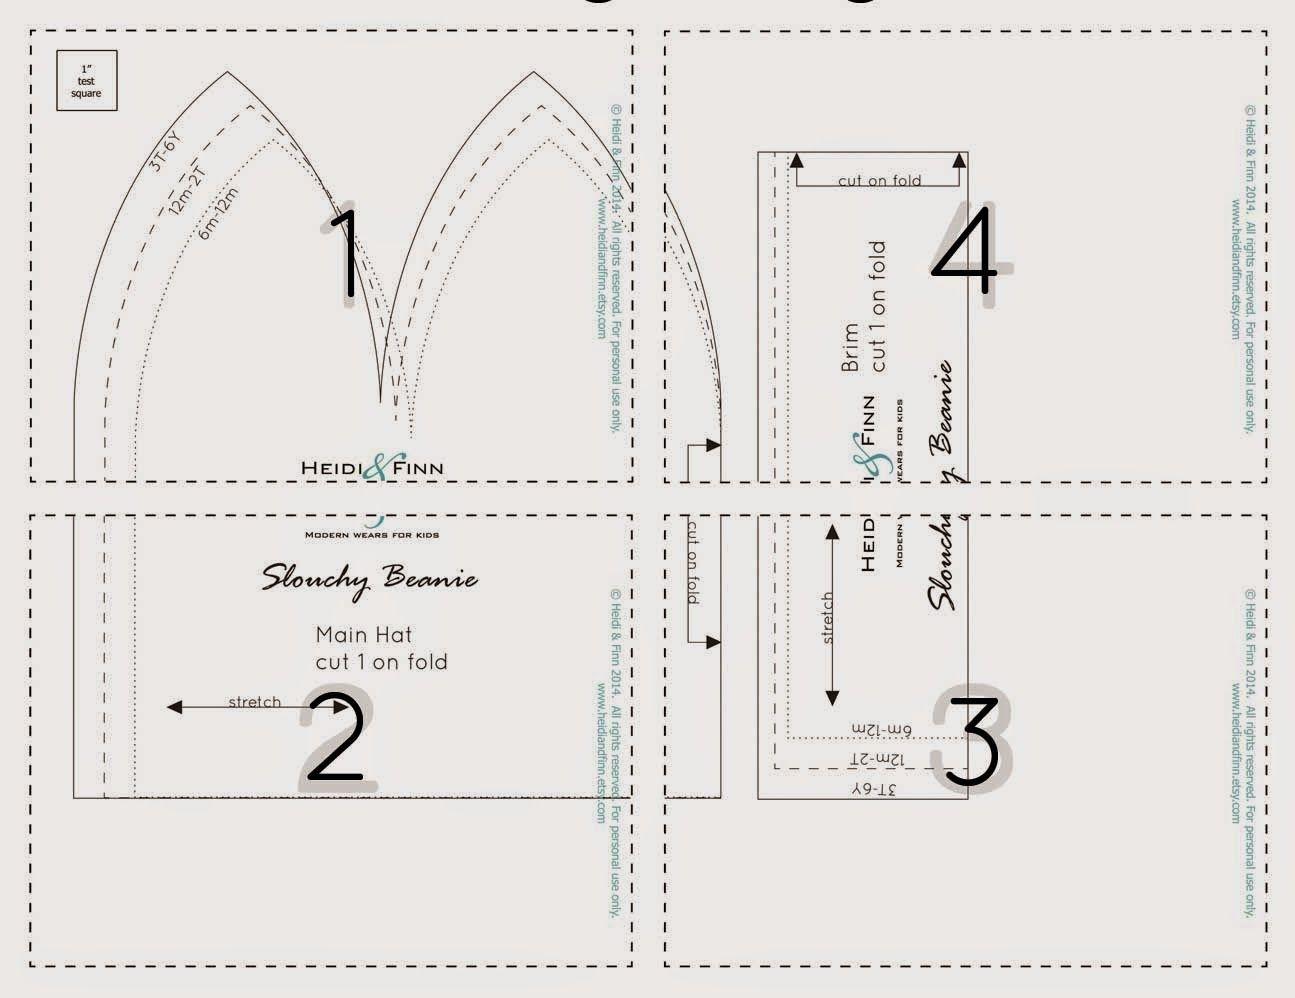 Free Cloche Hat Sewing Pattern에 대한 이미지 결과 | 강좌 | Pinterest